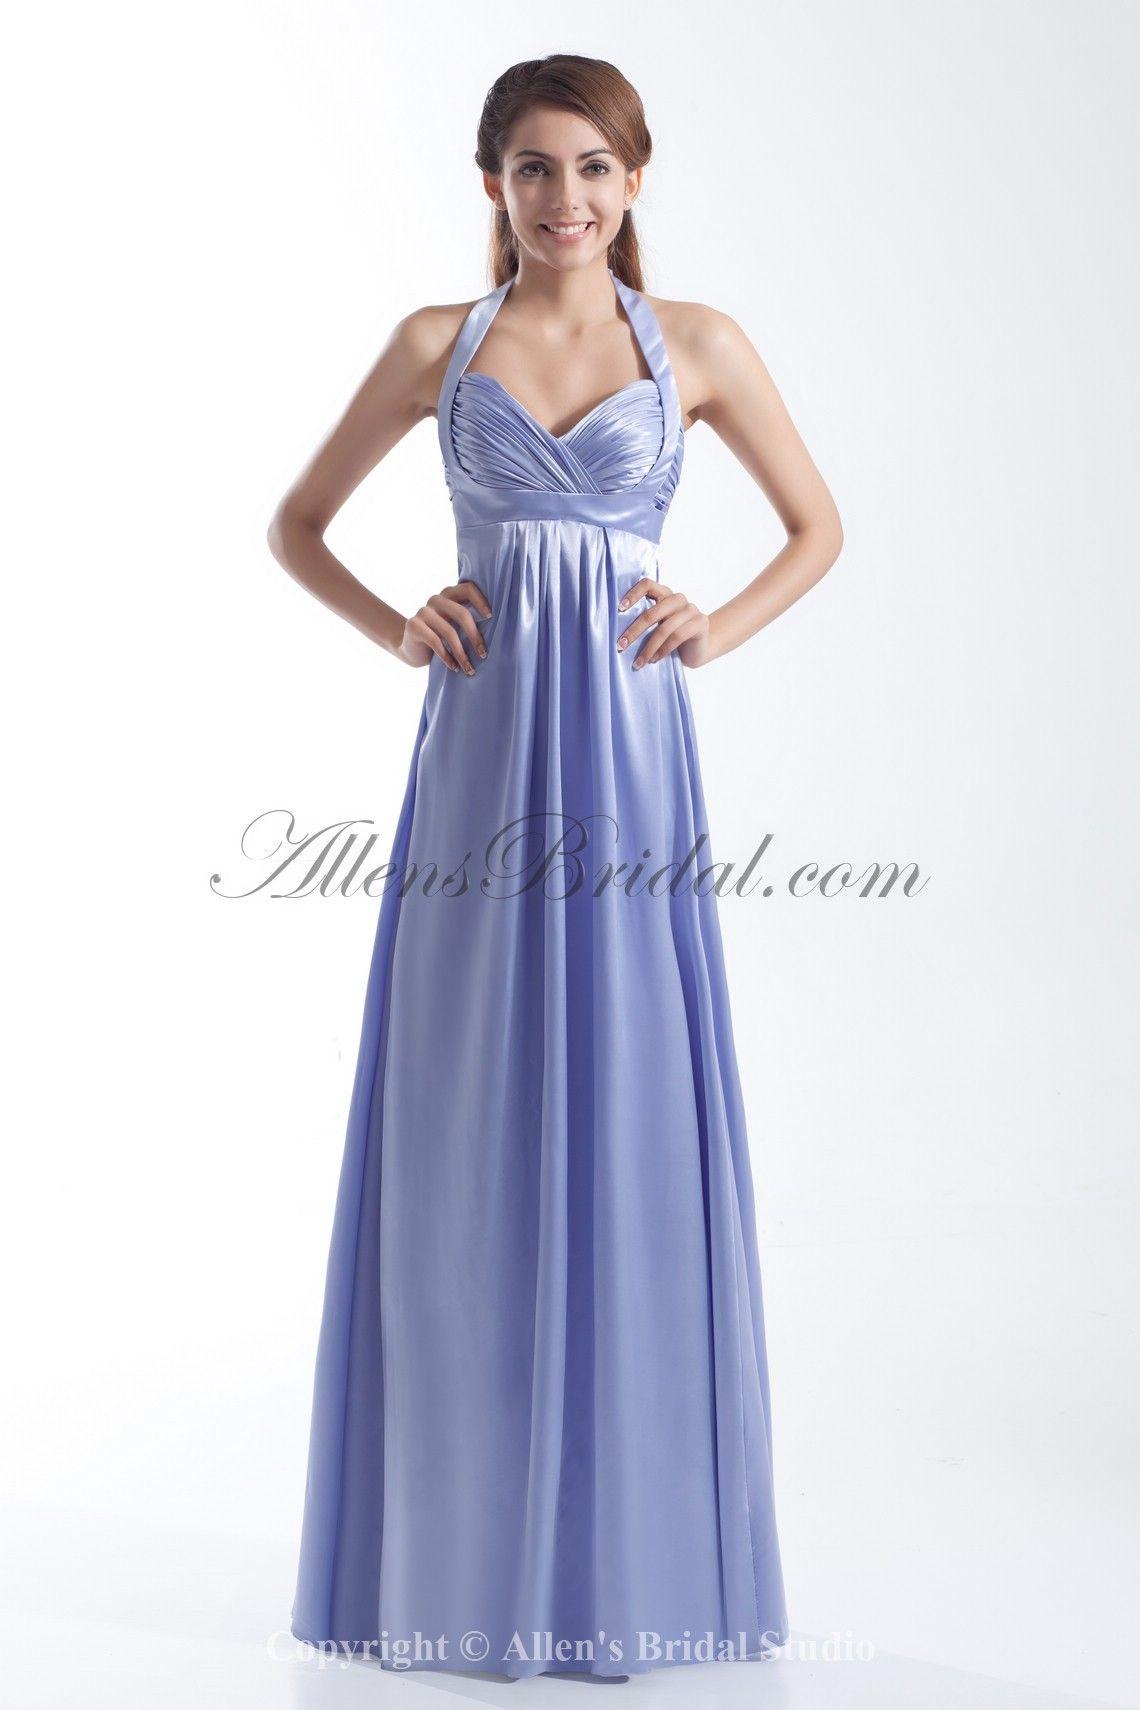 Satin halter neckline floor length column prom dress on sale at